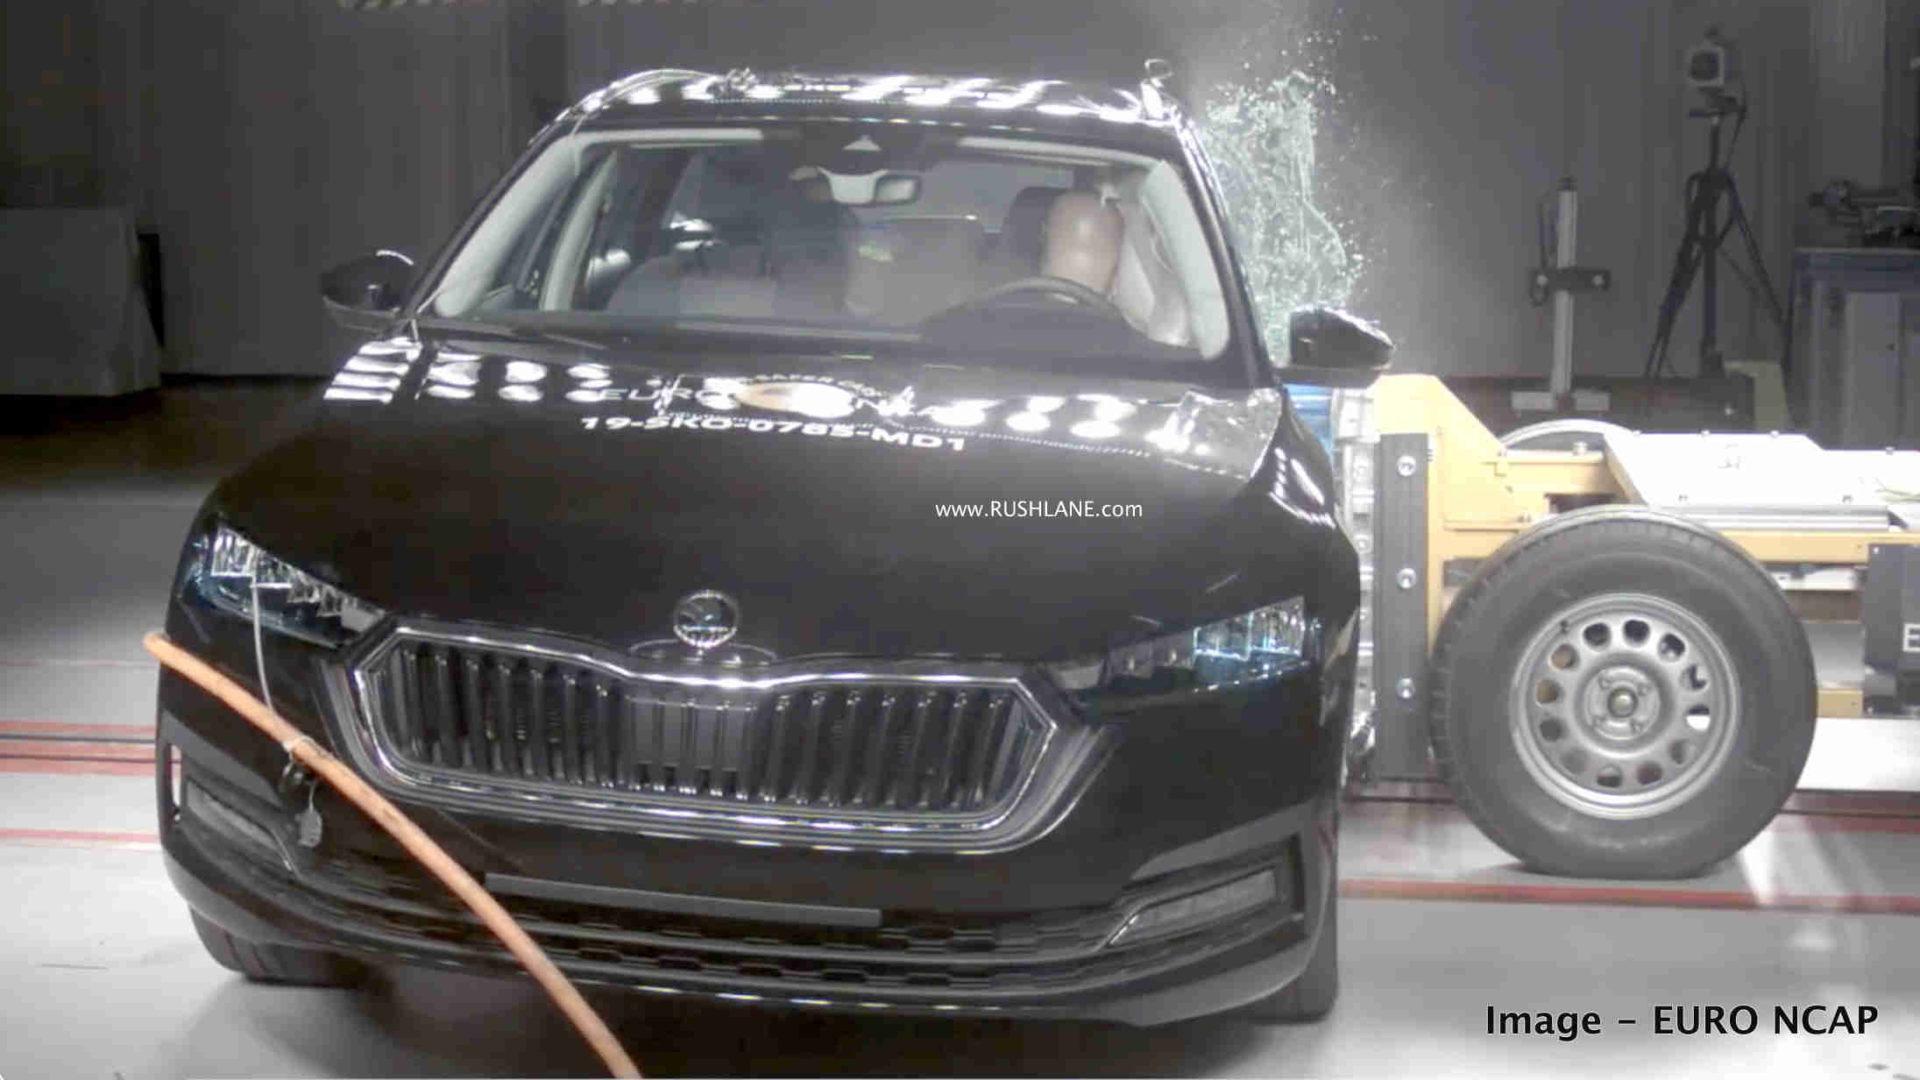 2020 Skoda Octavia crash testa